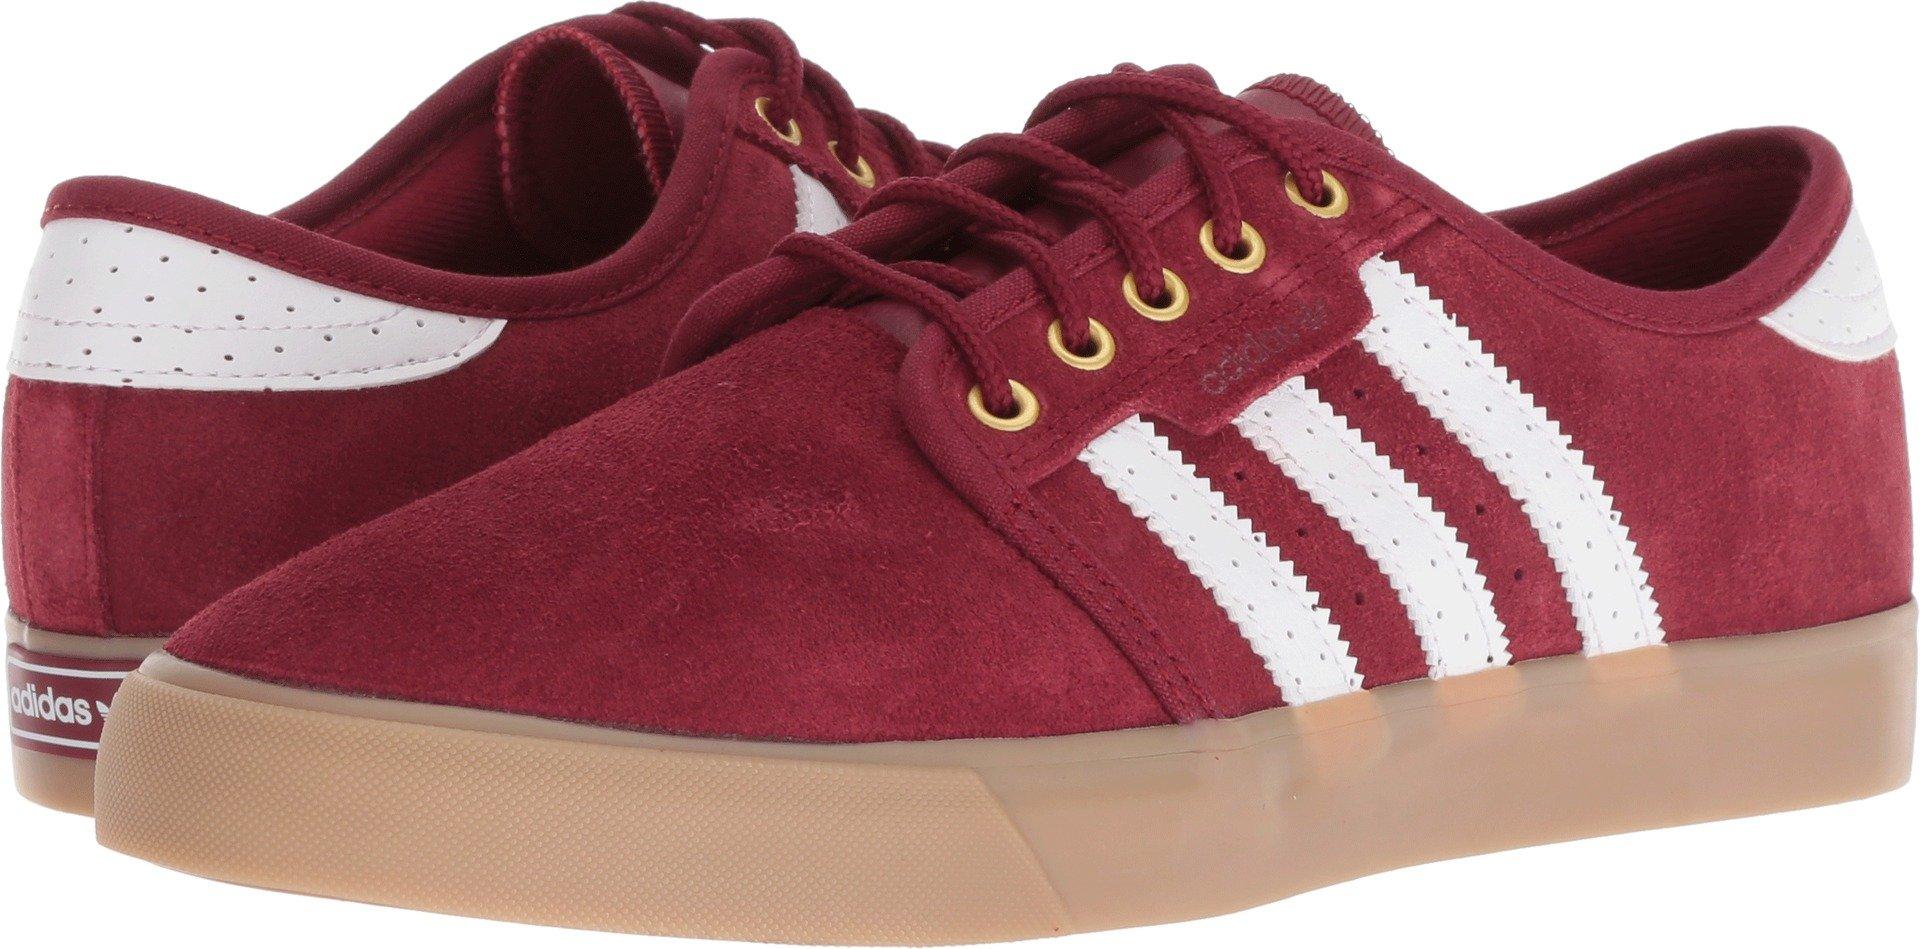 on sale eb495 3e4cc Galleon - Adidas Originals Men s Seeley Skate Shoe, Collegiate Burgundy  White Gold Metallic, 9 M US